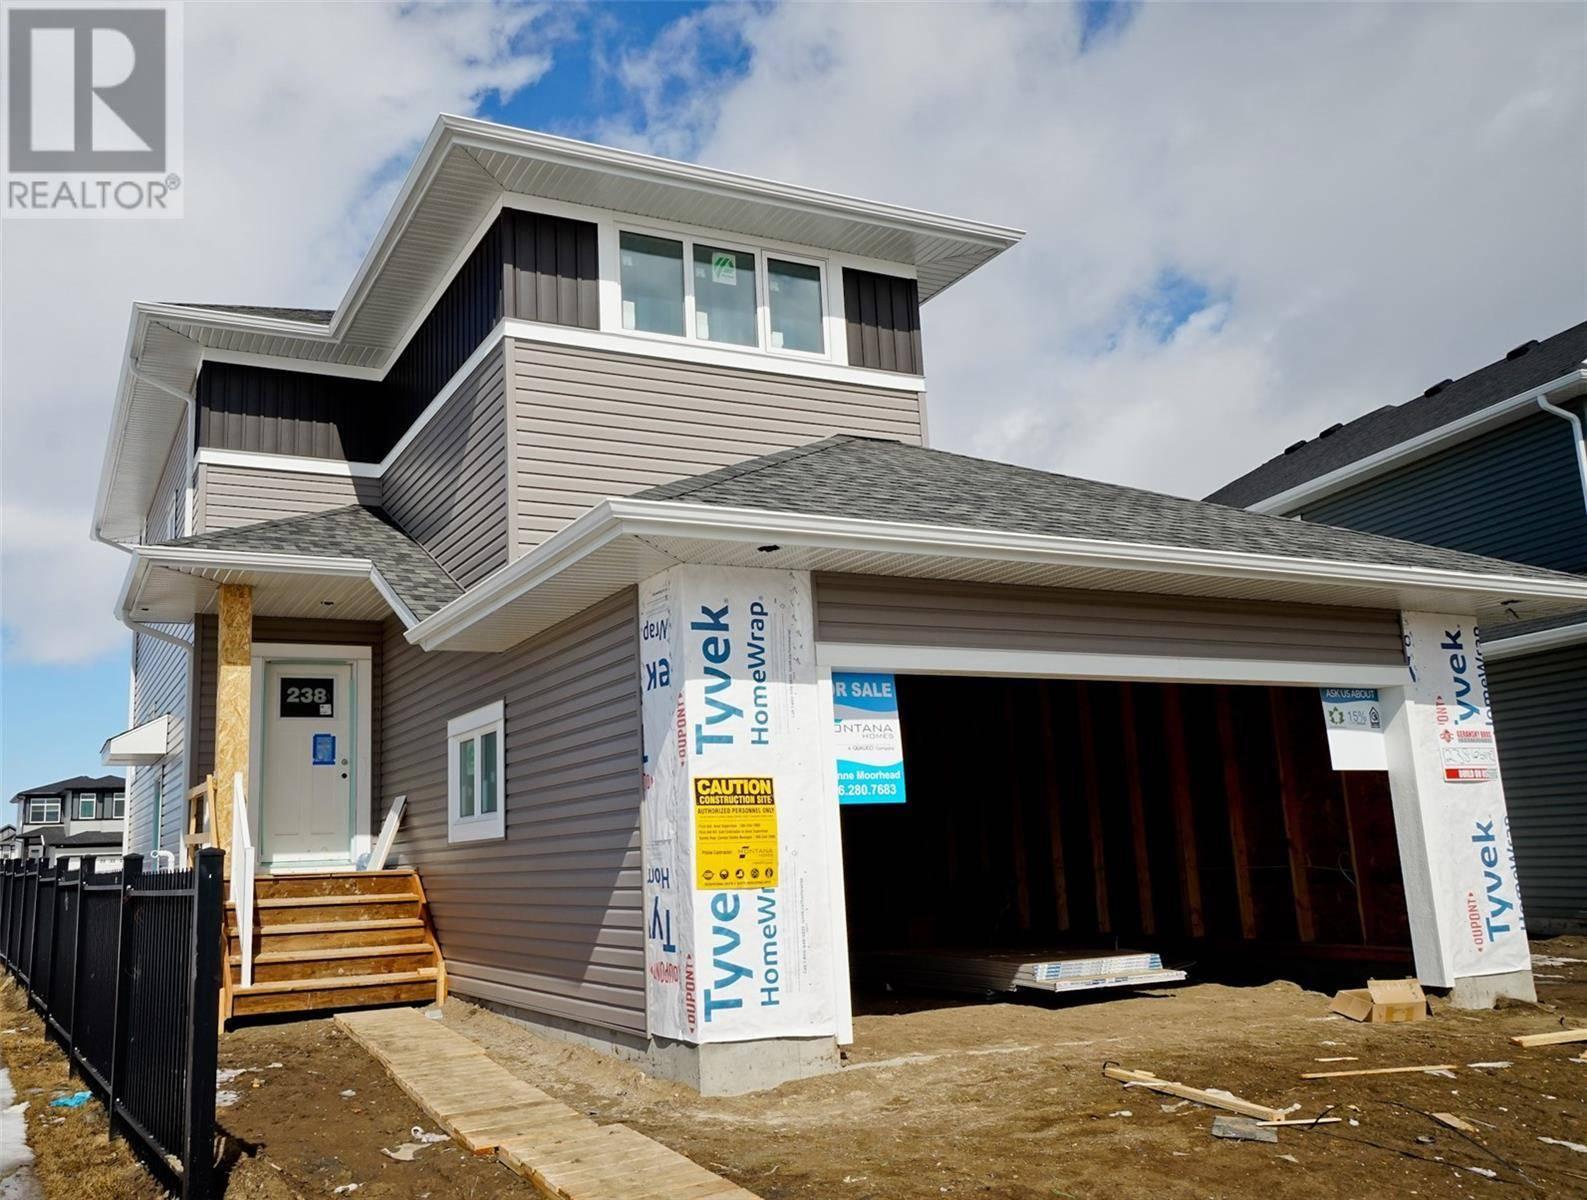 House for sale at 238 Labine Bnd  Saskatoon Saskatchewan - MLS: SK804736